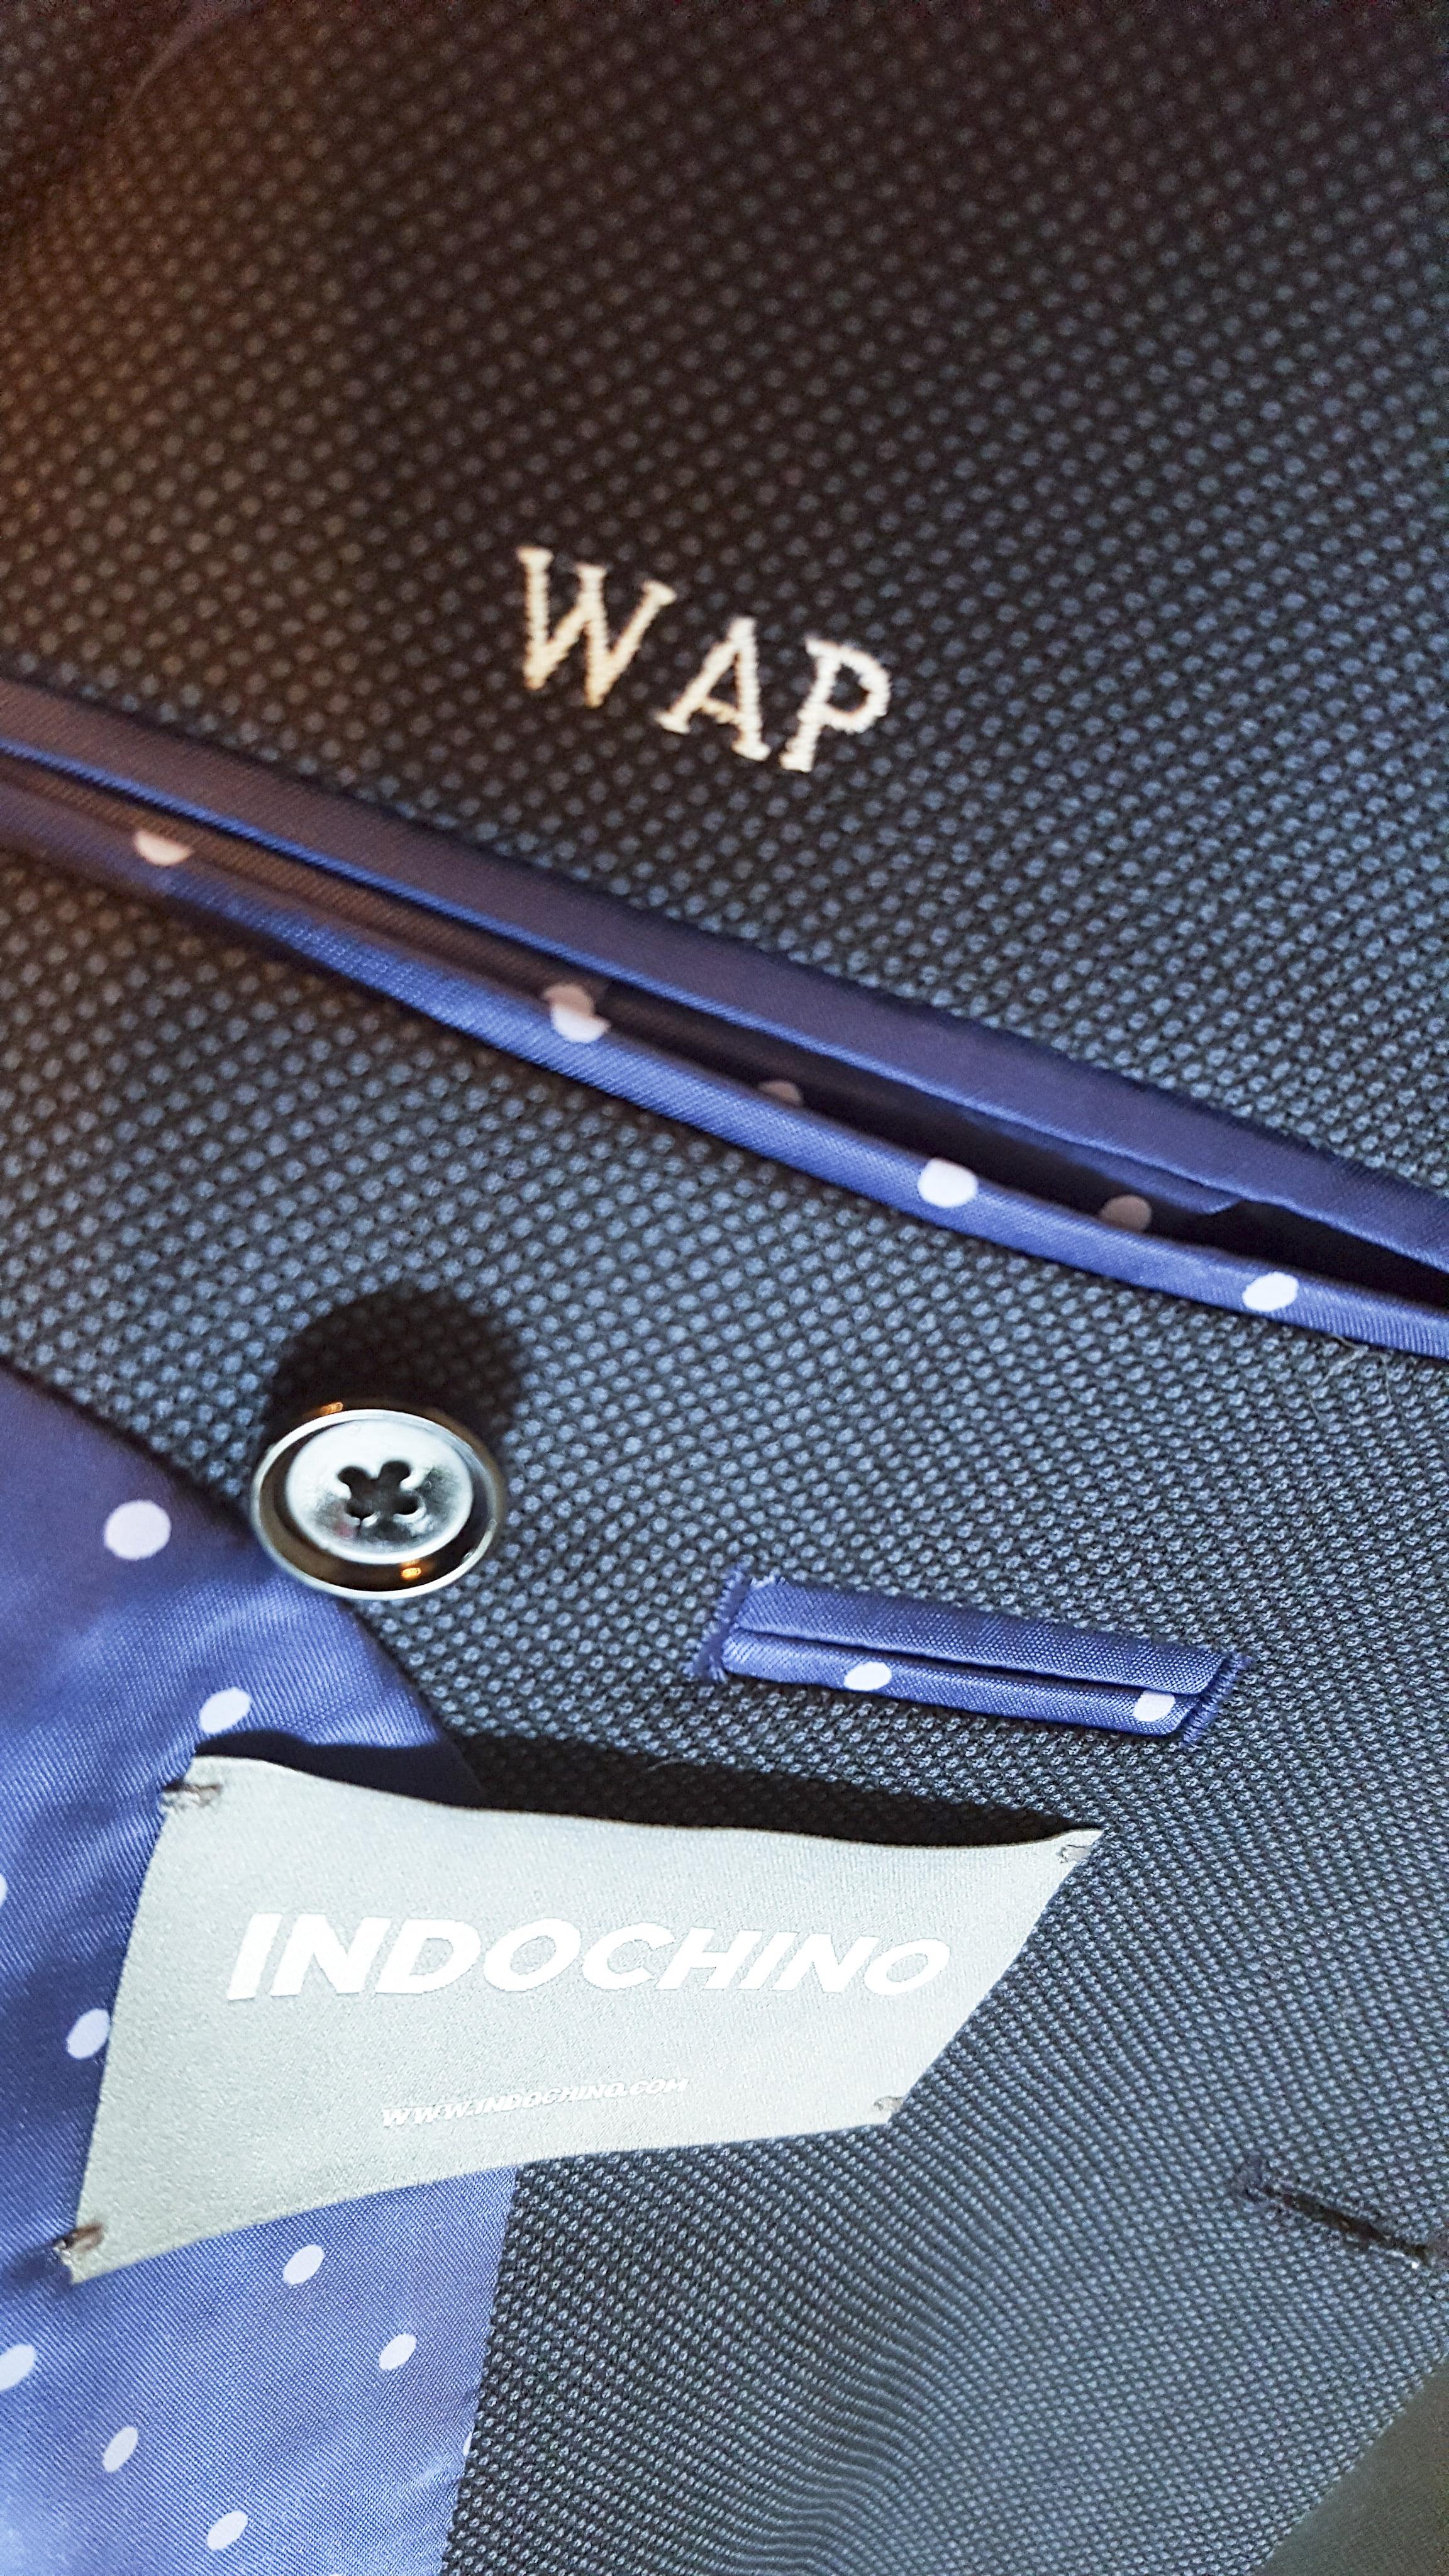 Indochino suit